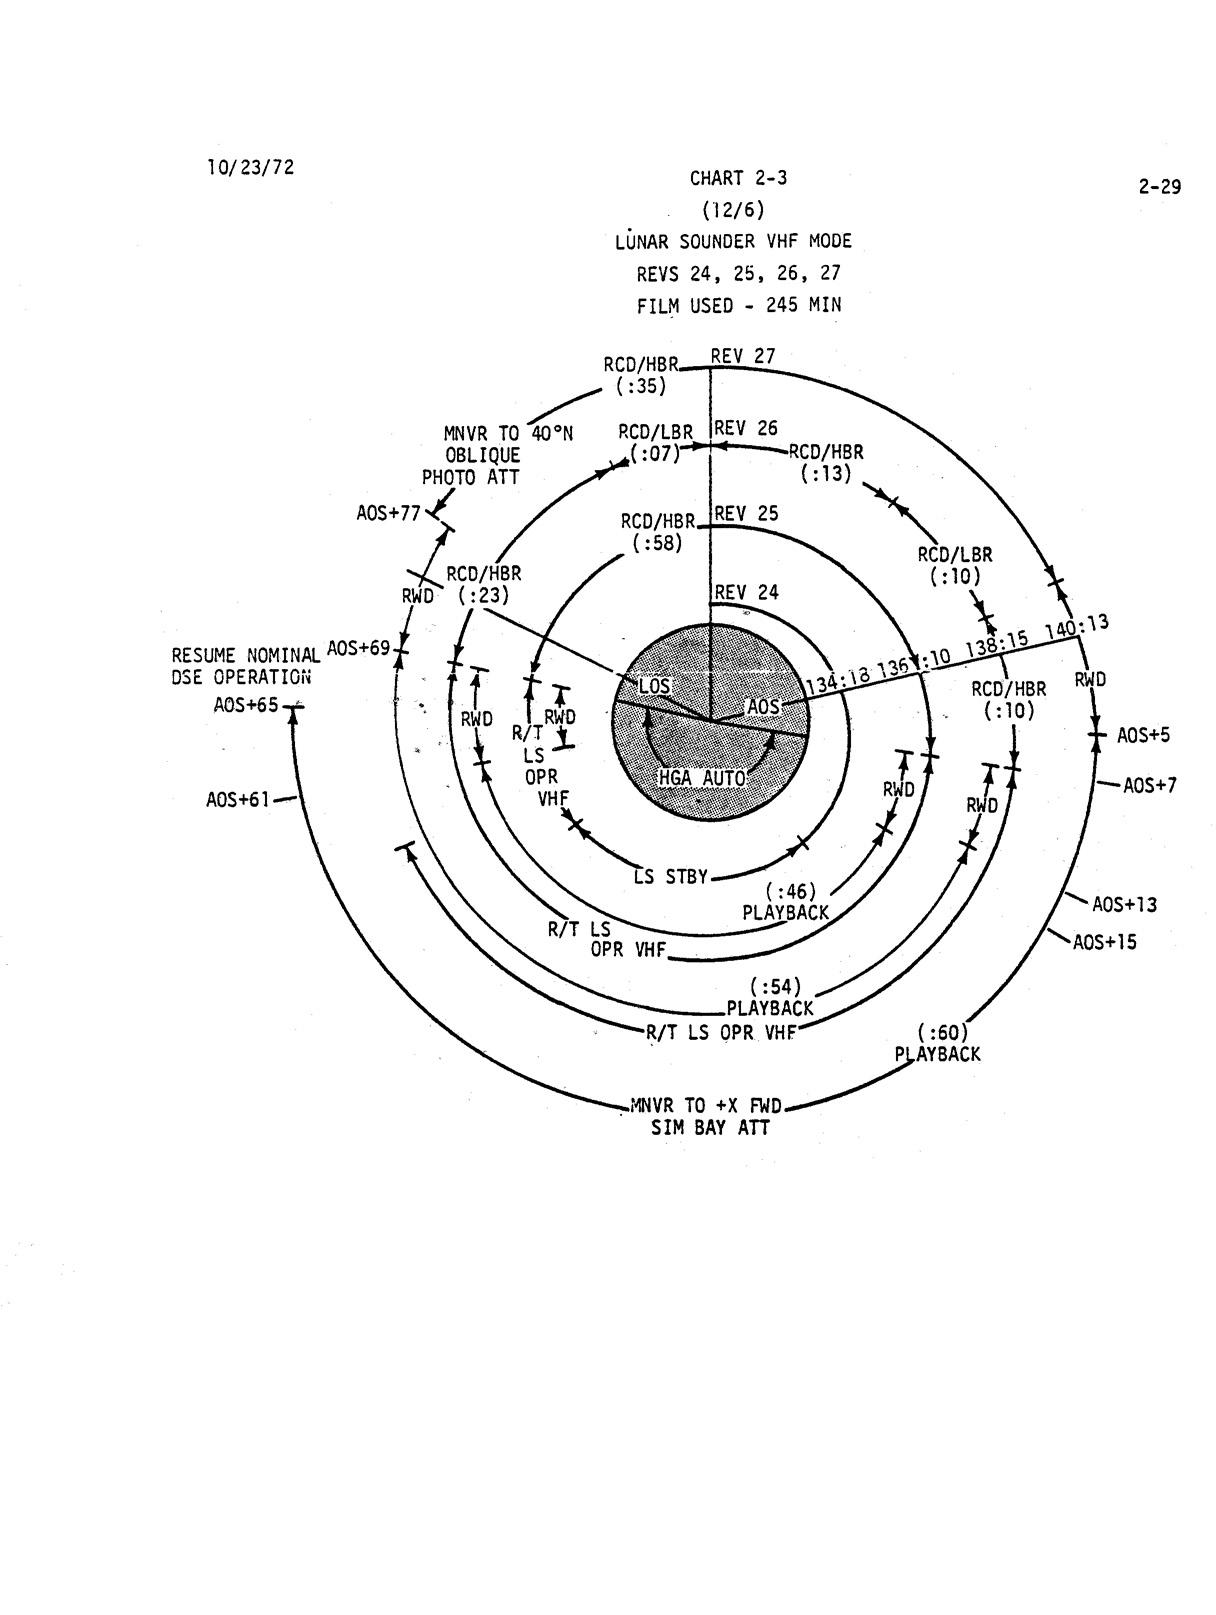 apollo 17 flight journal flight plan index Flans Plane Mod 2 030 chart 2 4 lunar sounder receive only sep on revs 39 40 41